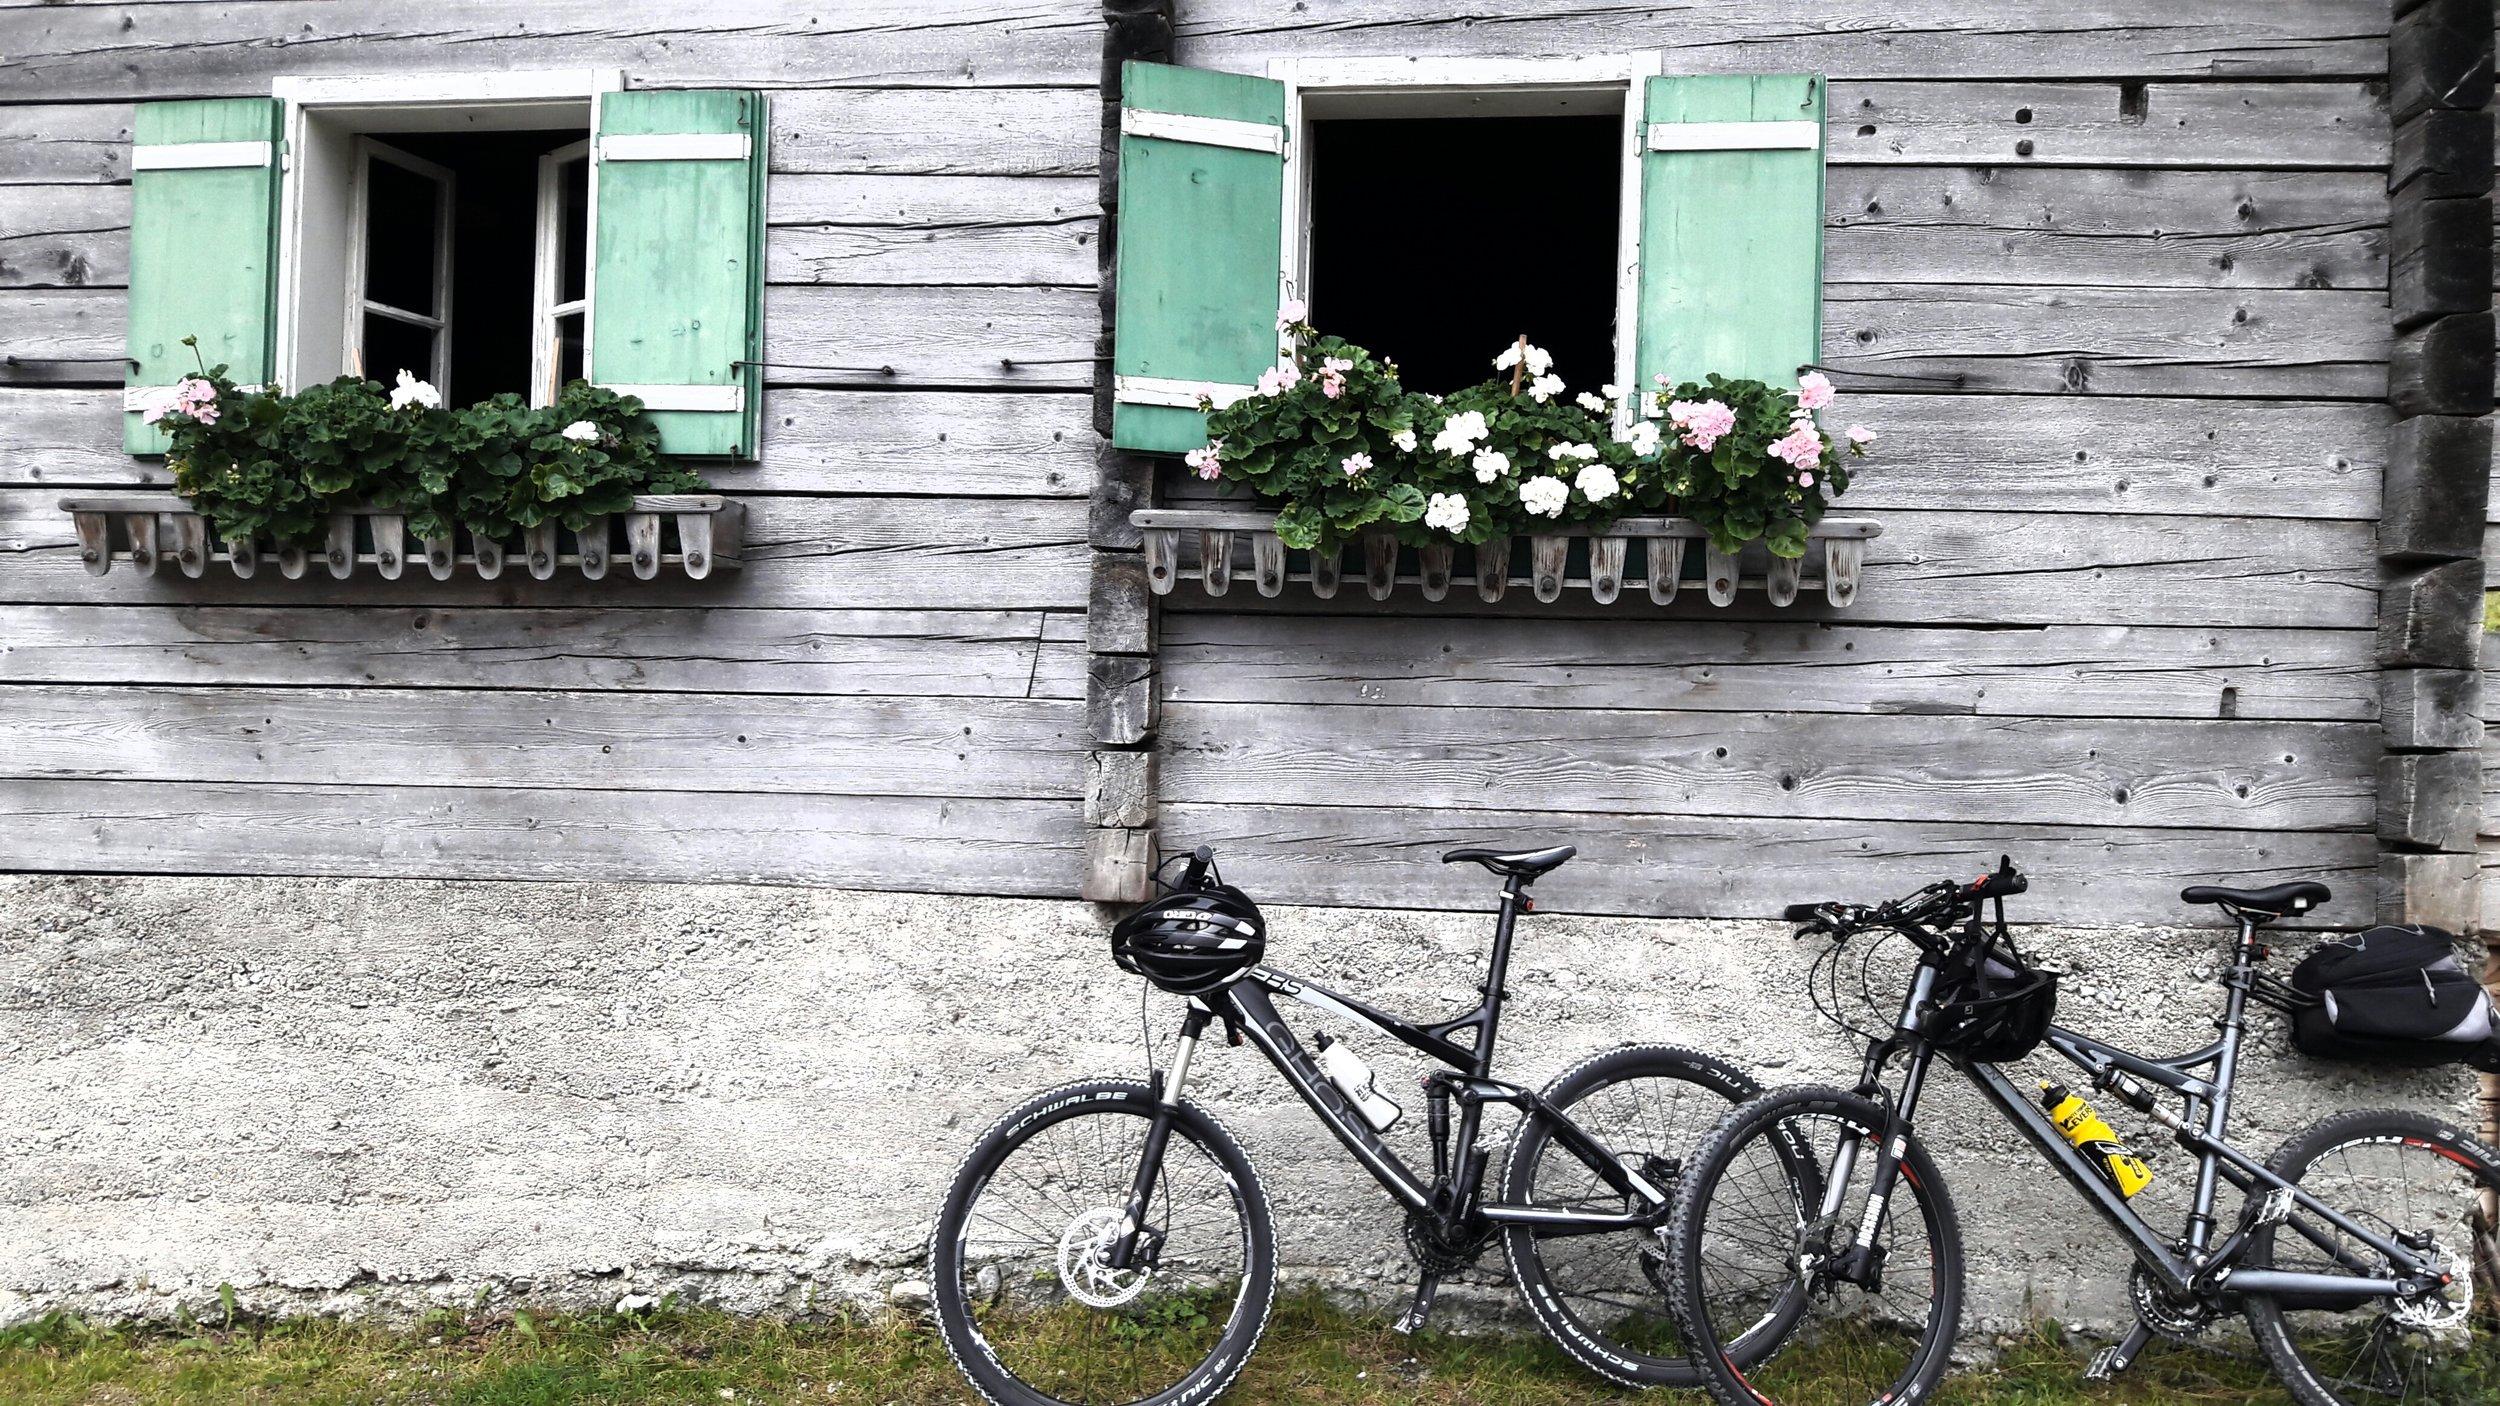 Taking a rest at Marbachquelle, Flachauwinkl, Austria July 2017